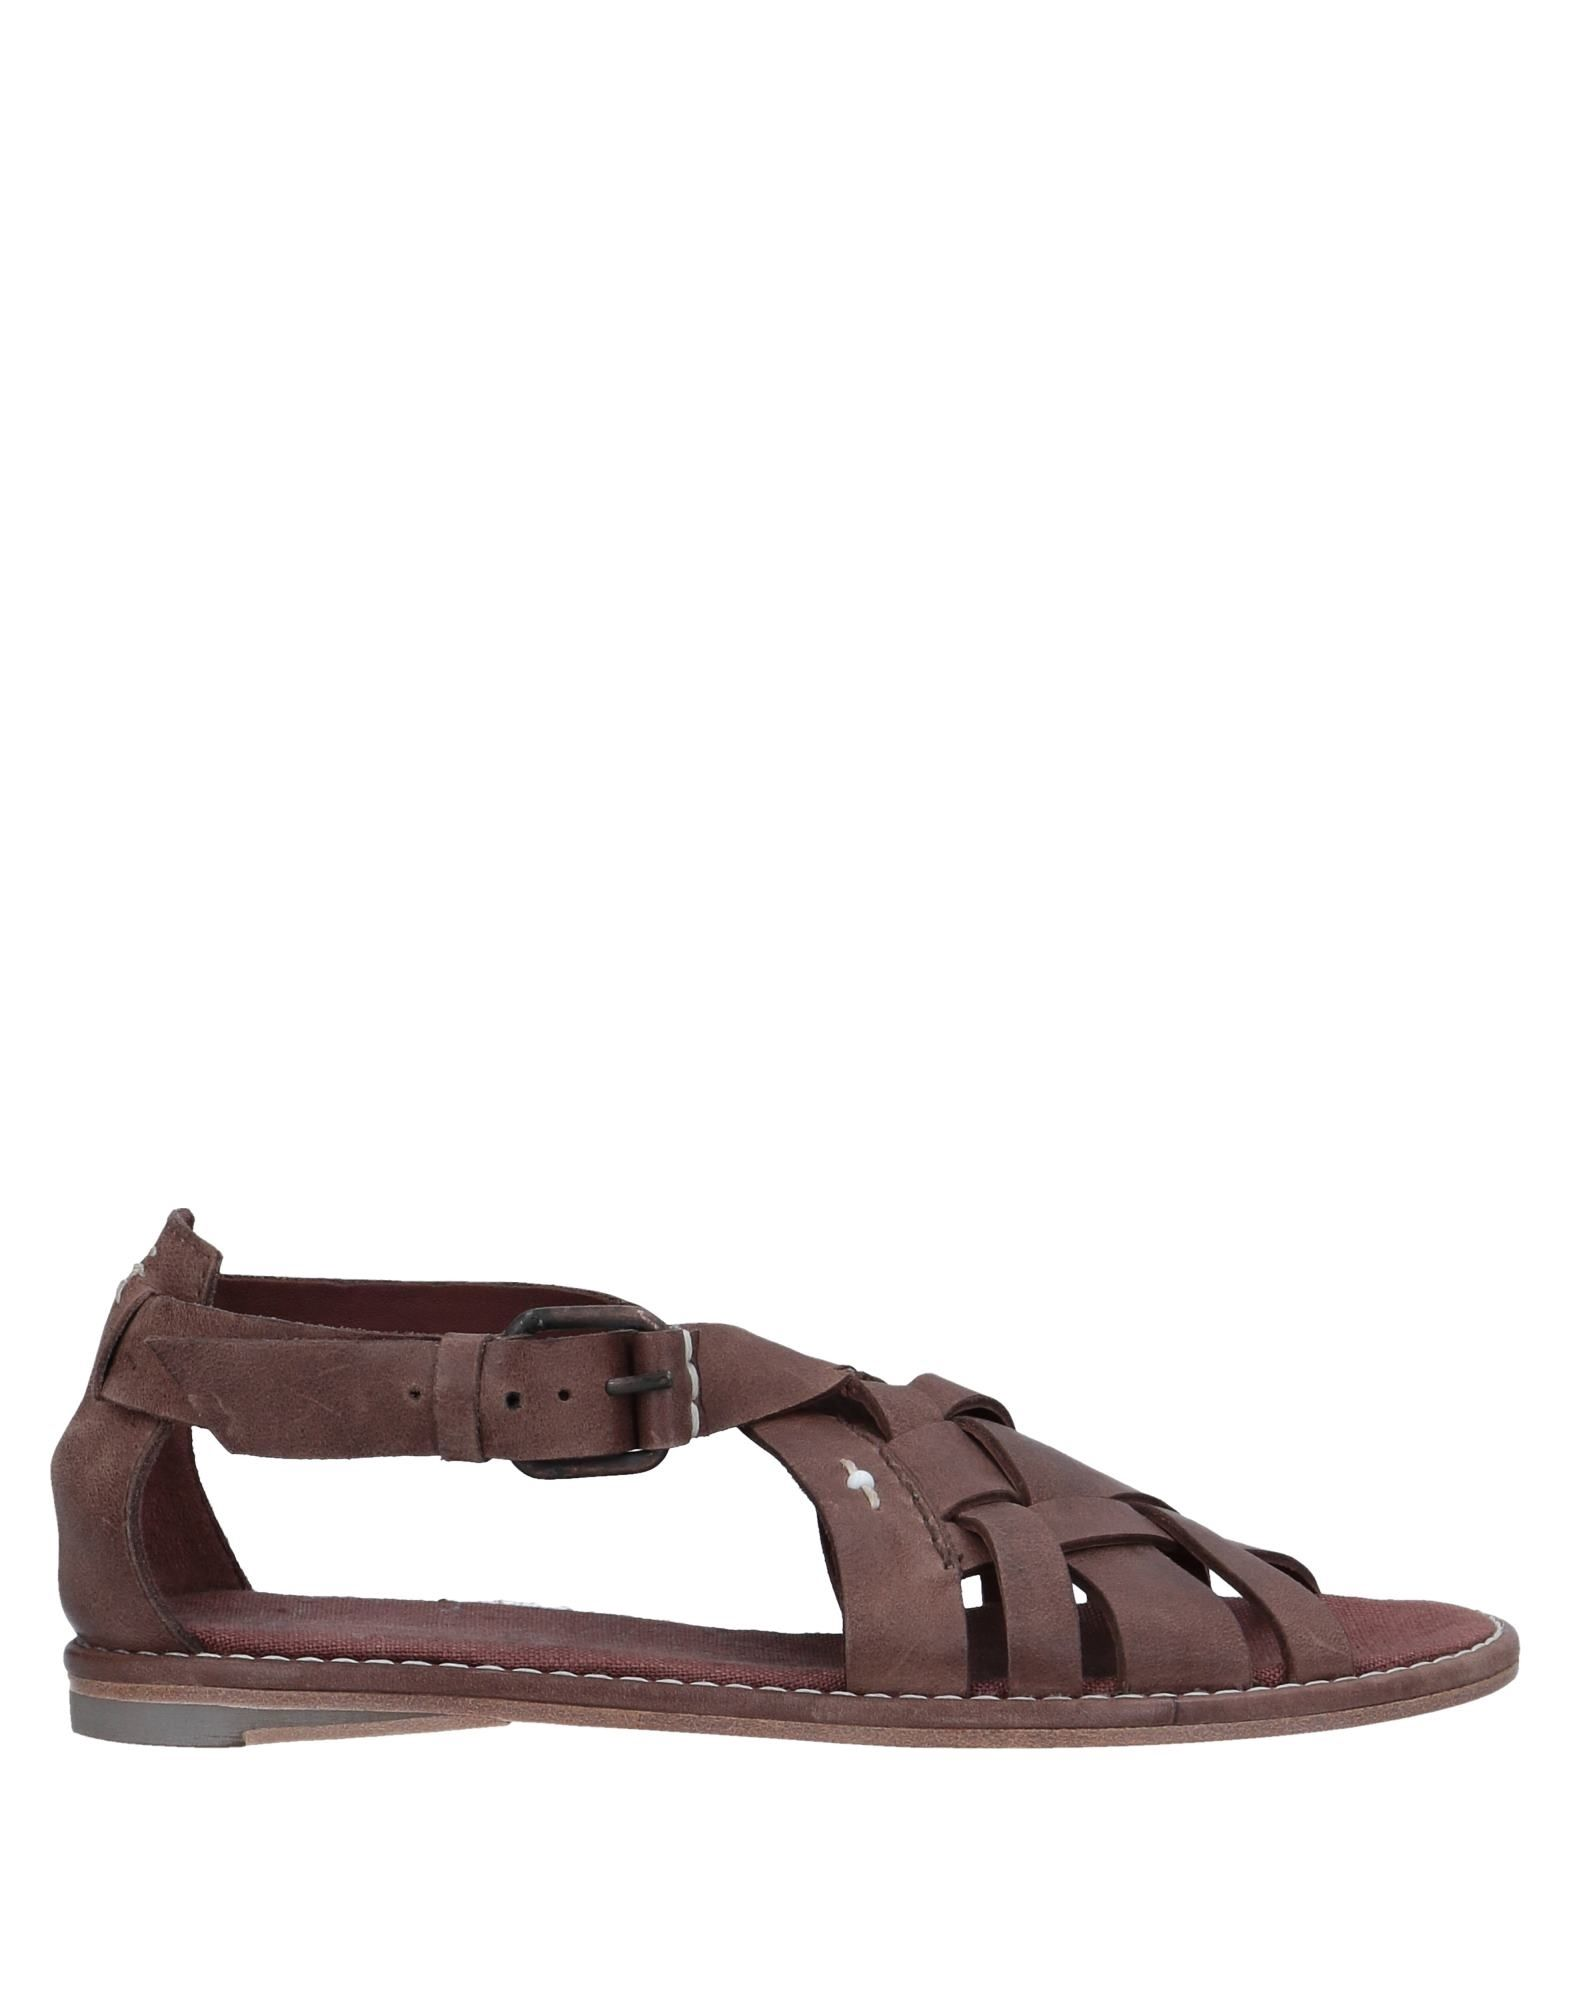 Henry Beguelin Sandals - Women on Henry Beguelin Sandals online on Women  United Kingdom - 11508512IO 58c223